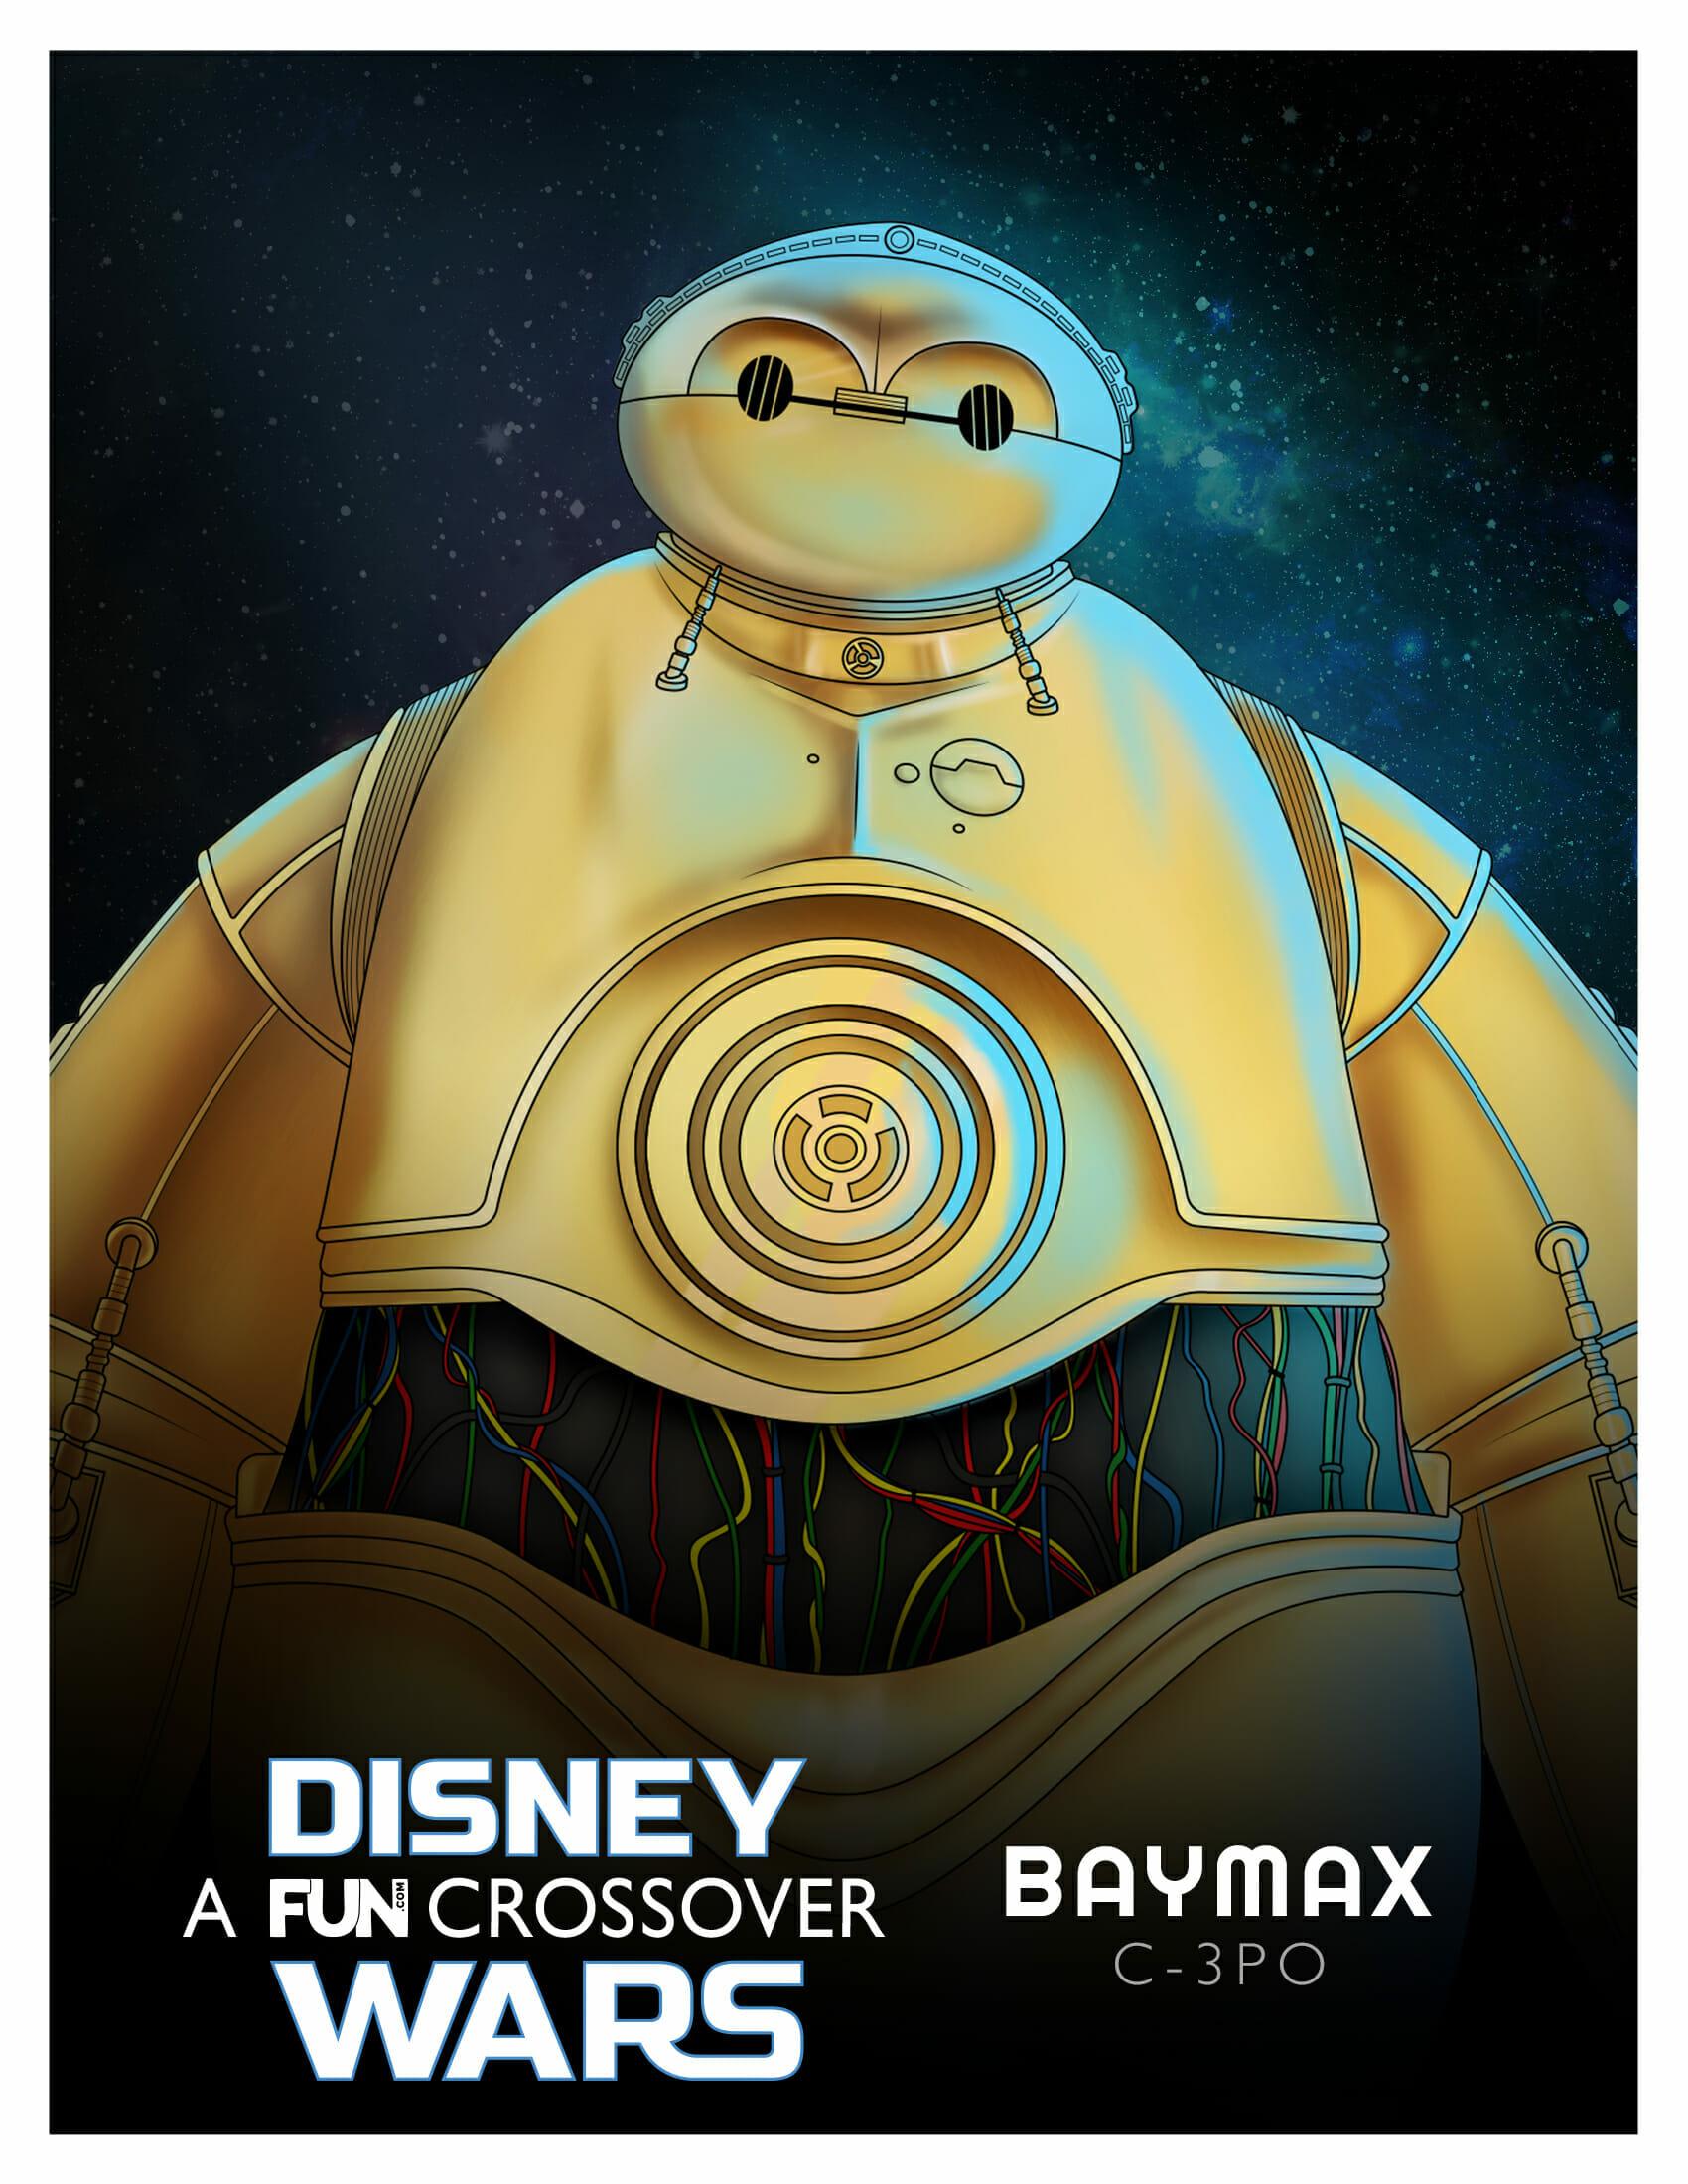 Baymax C3PO